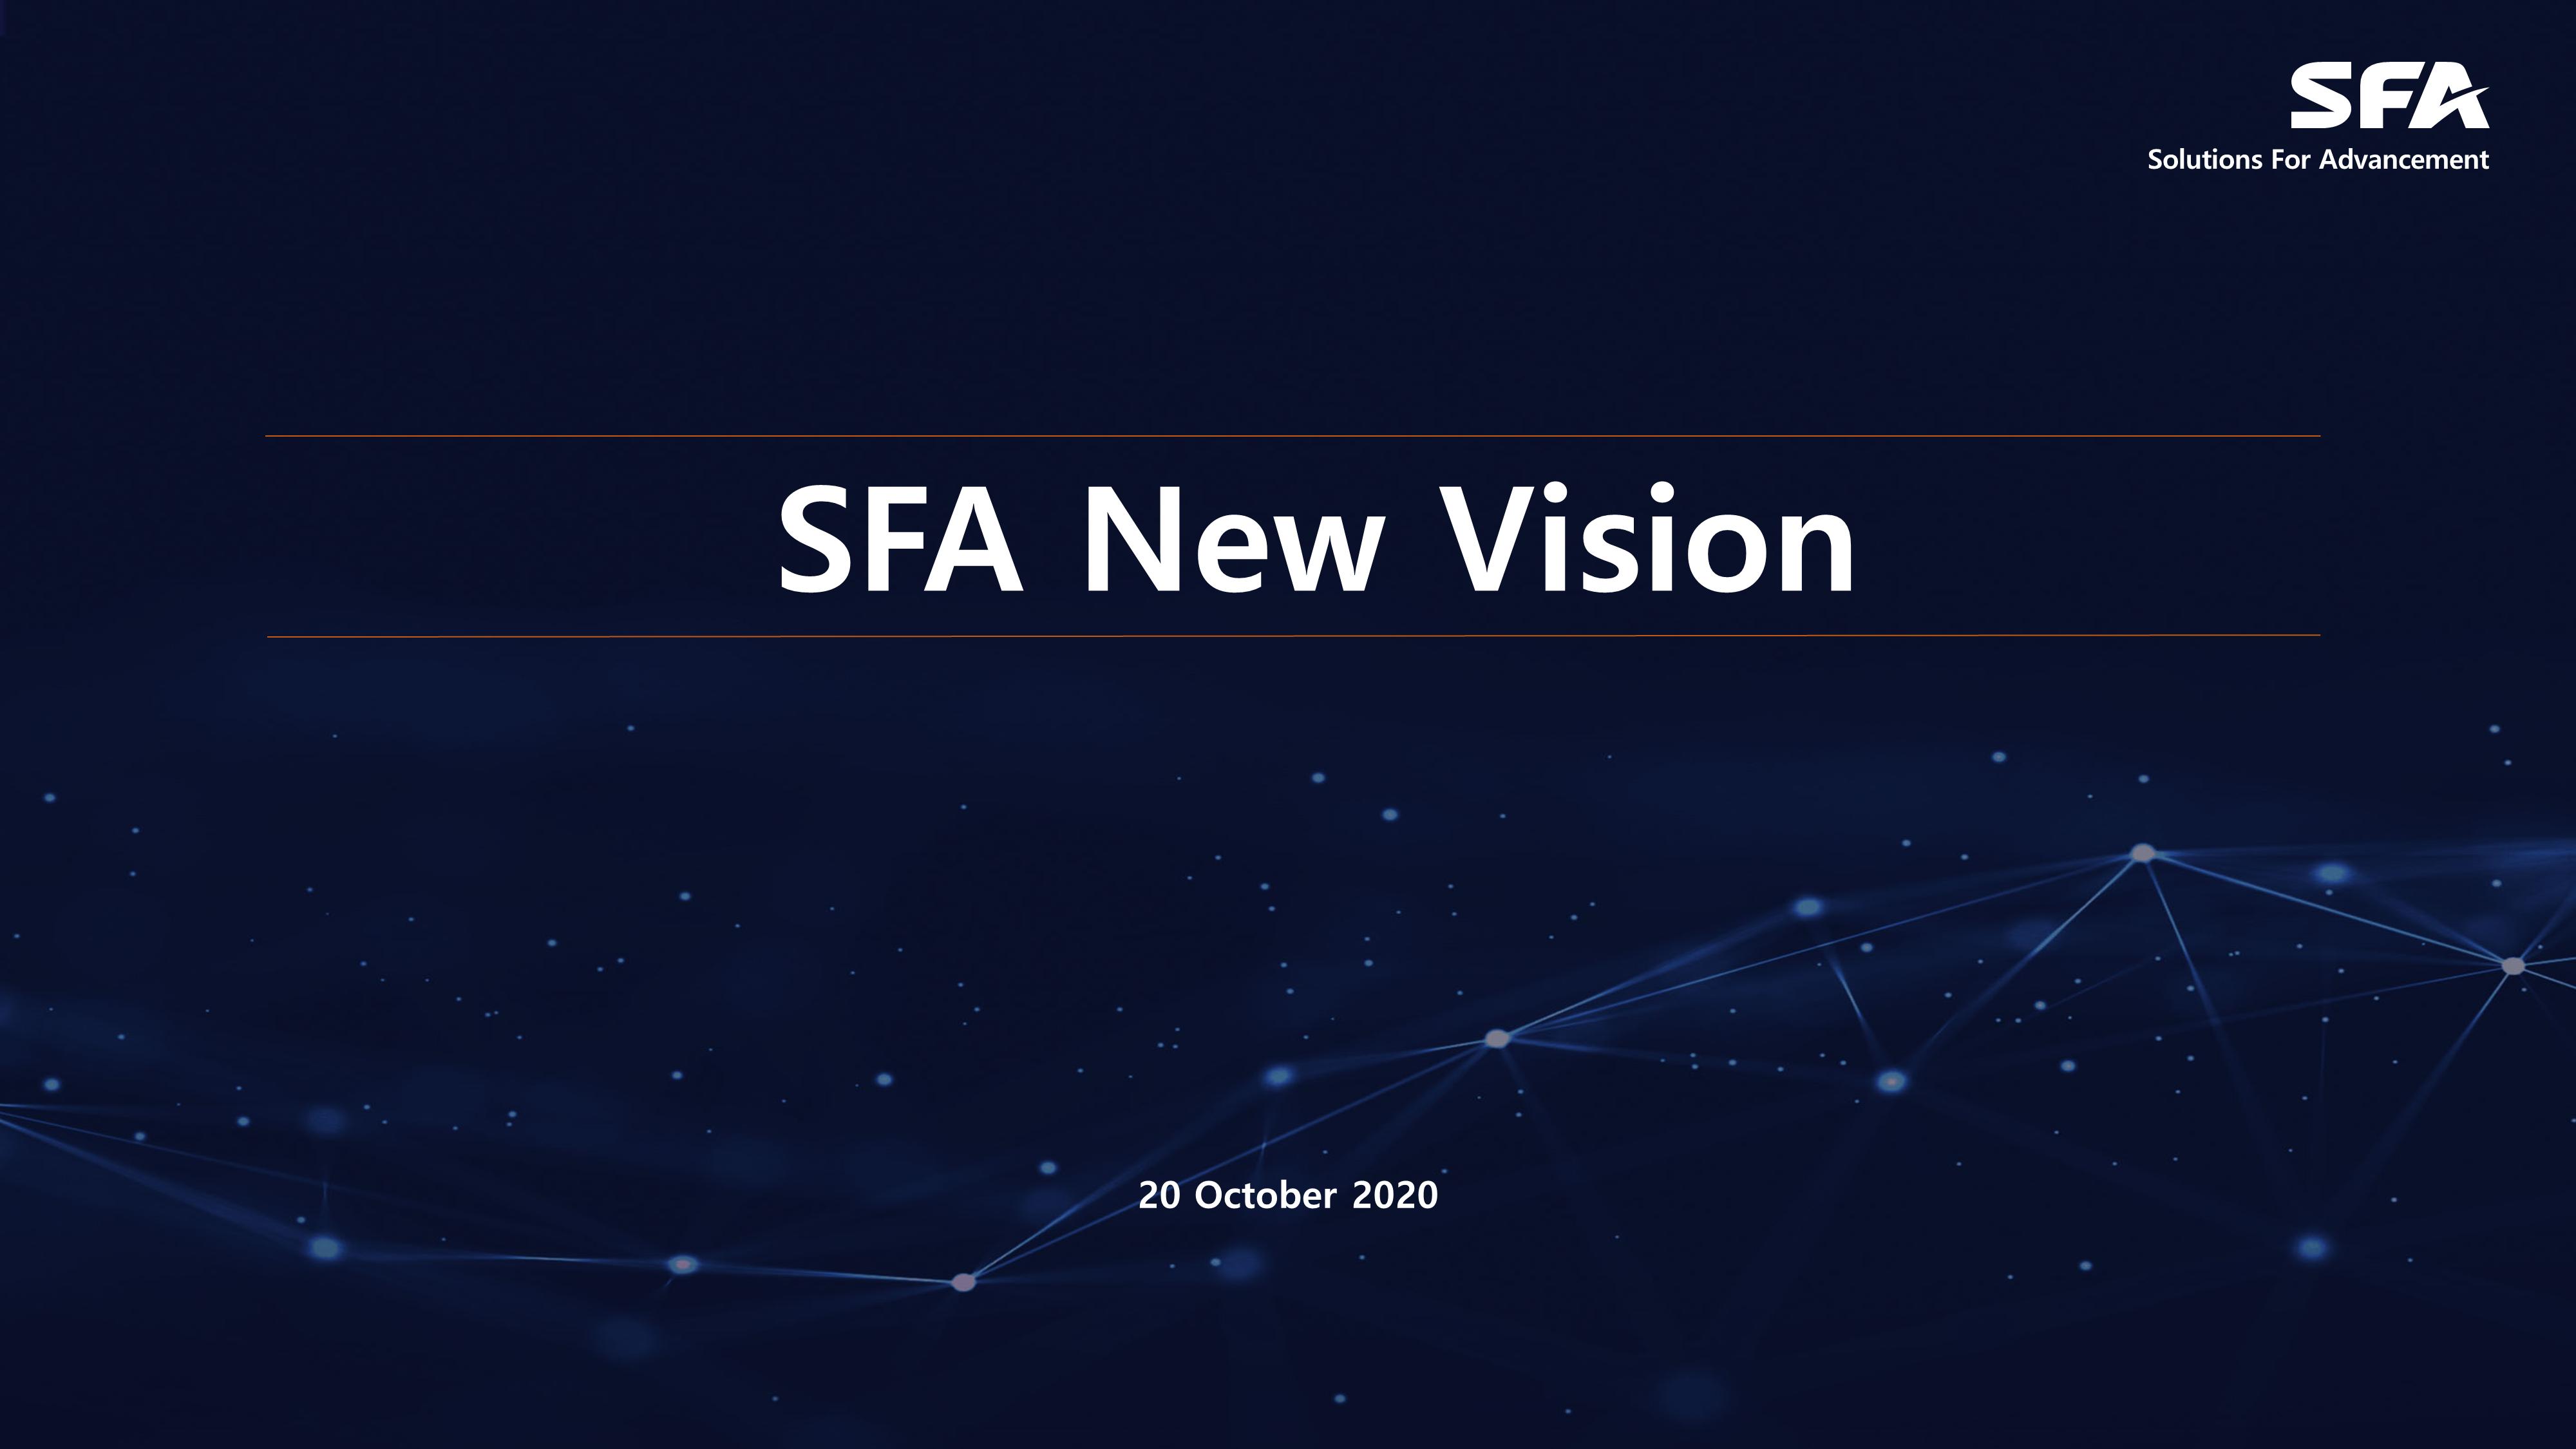 SFA New Vision